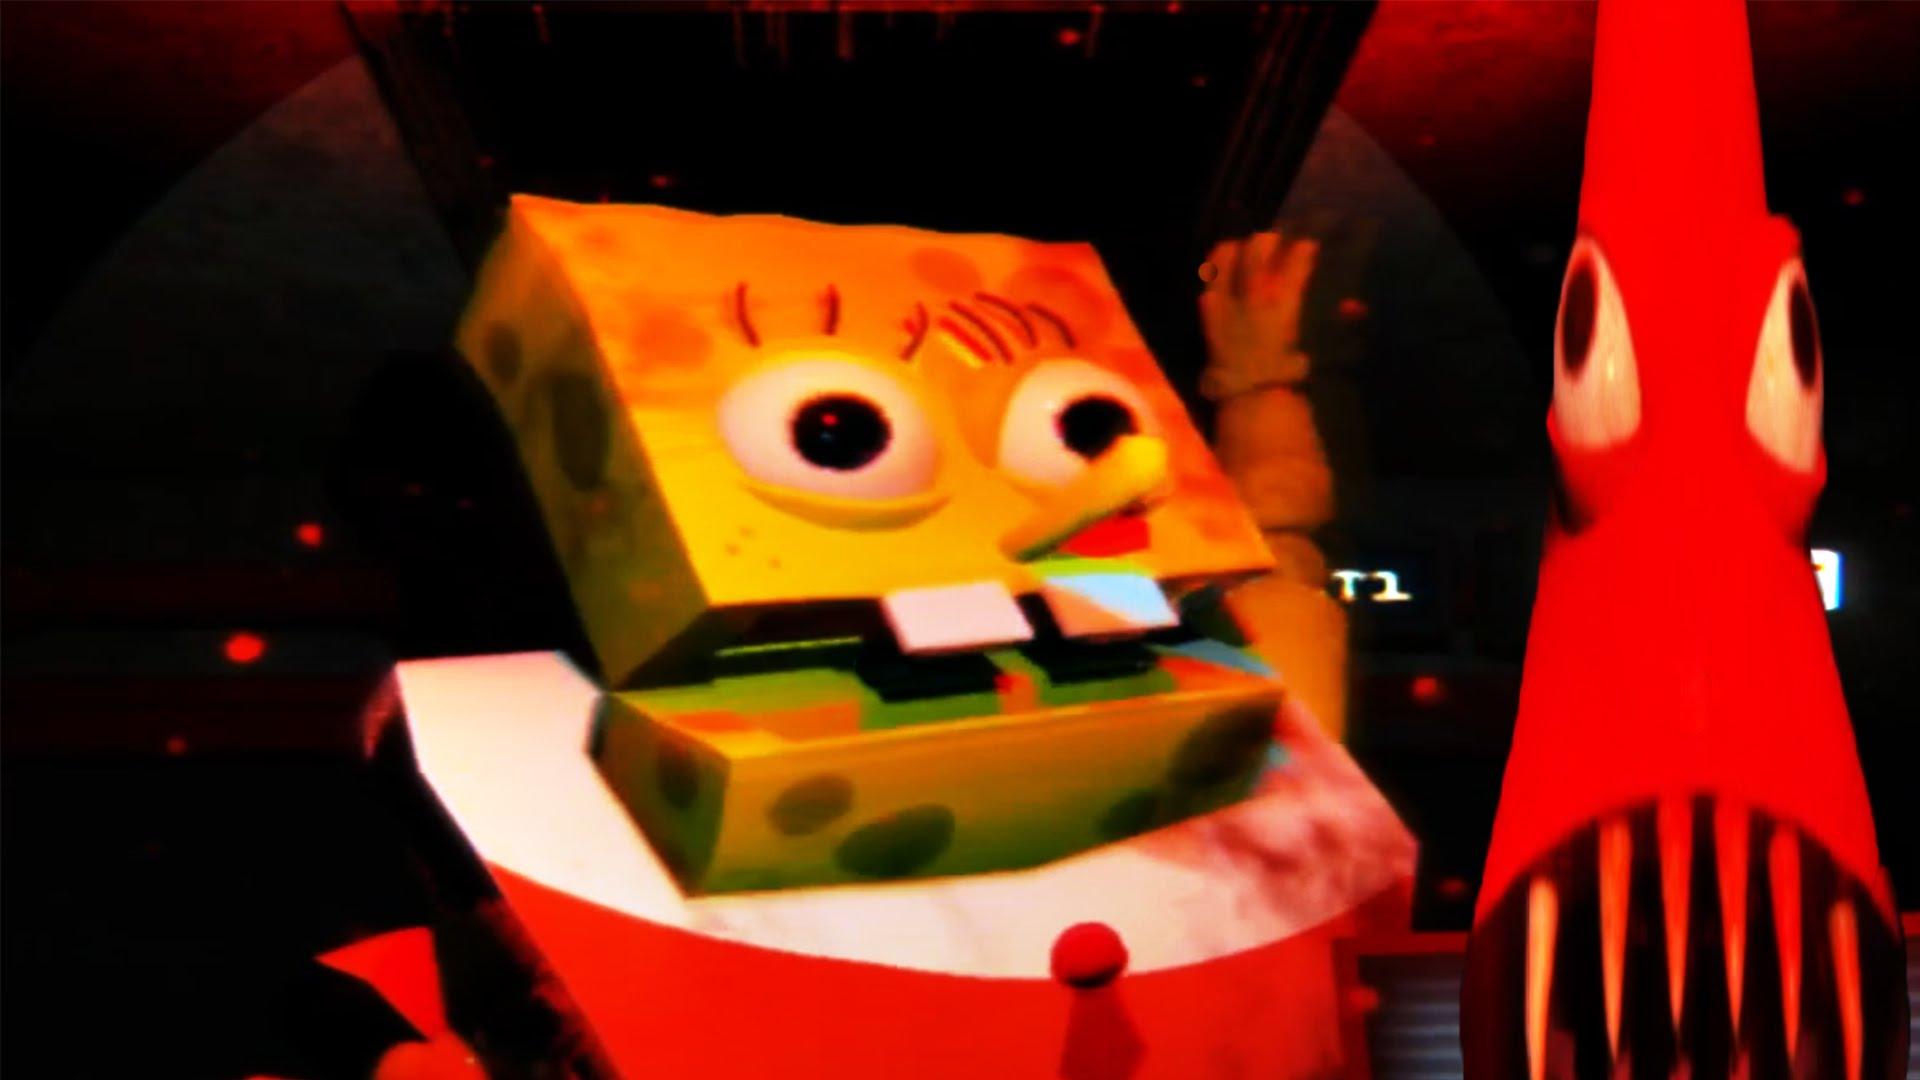 Frame from Spongebob's Jumpscare